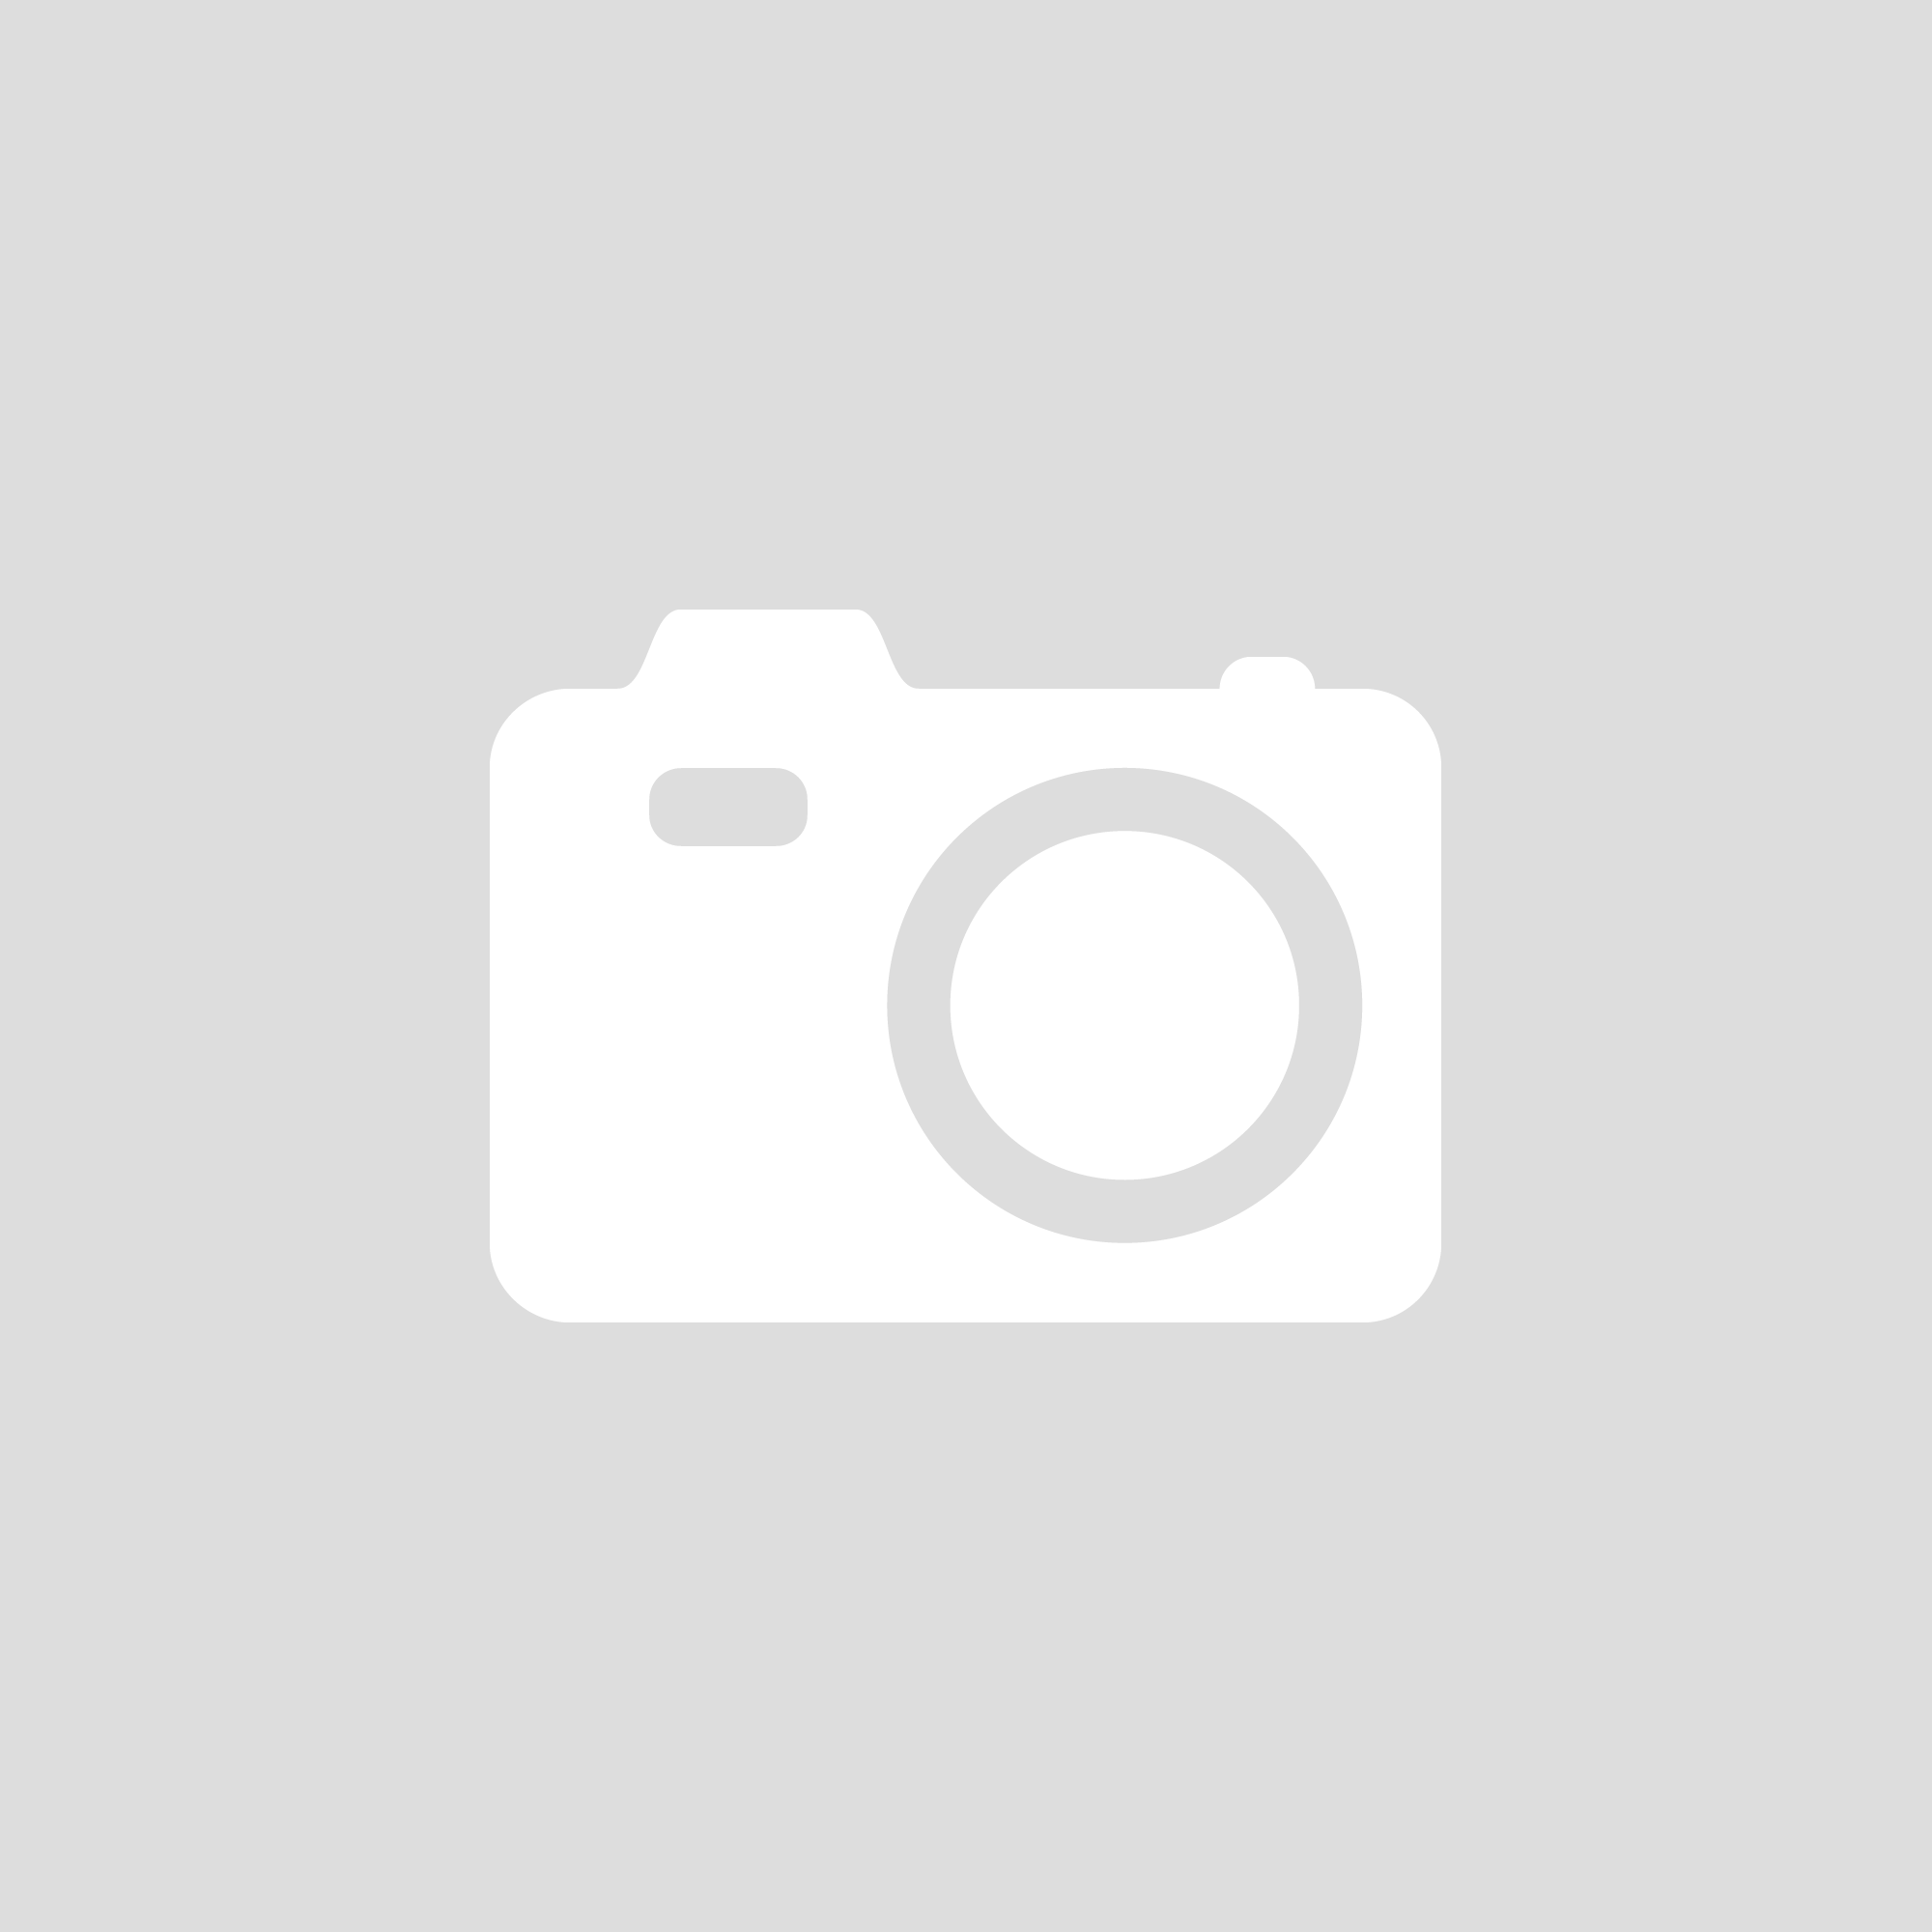 Fresco Rico Stripe Wallpaper Amethyst / Apple Mix by Graham & Brown 50-525